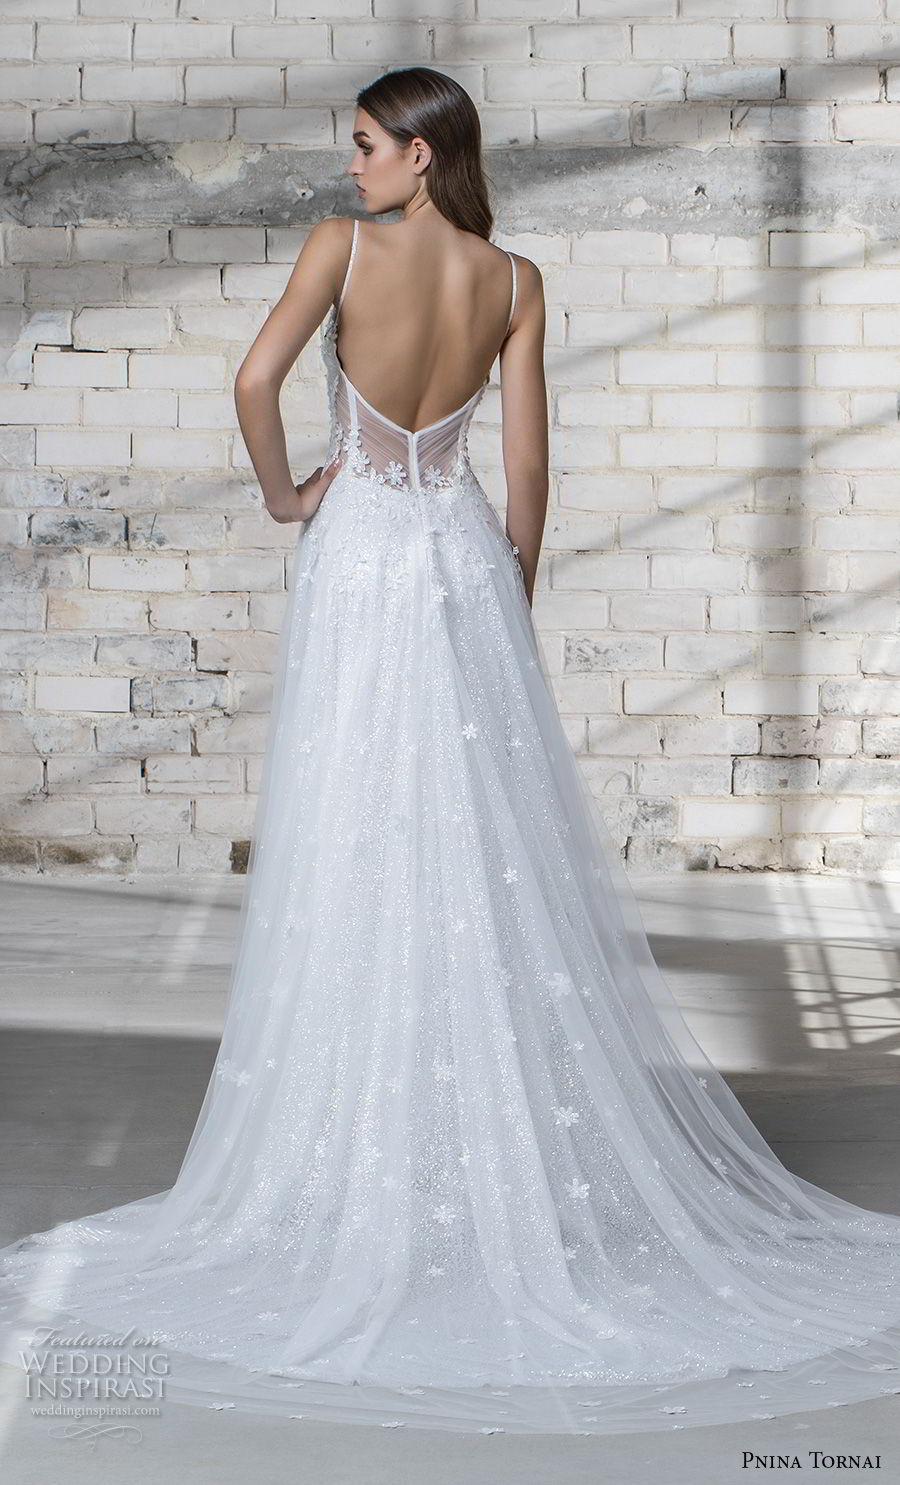 pnina tornai wedding dresses prices photo - 1